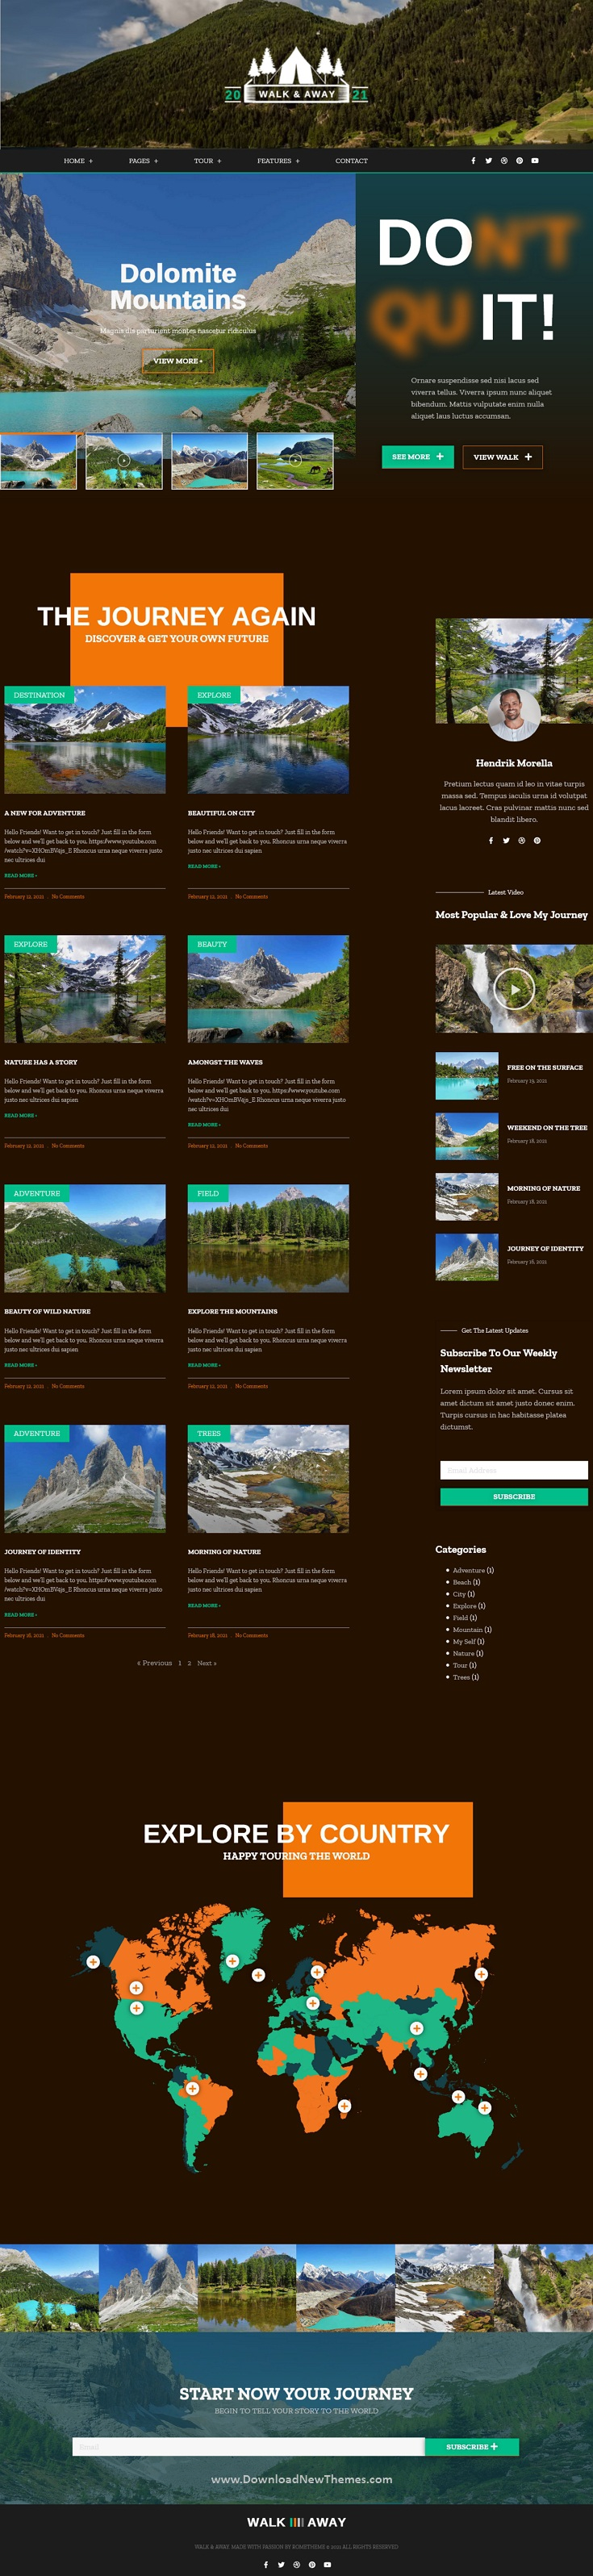 Travel Blog & Tours Elementor Template Kit